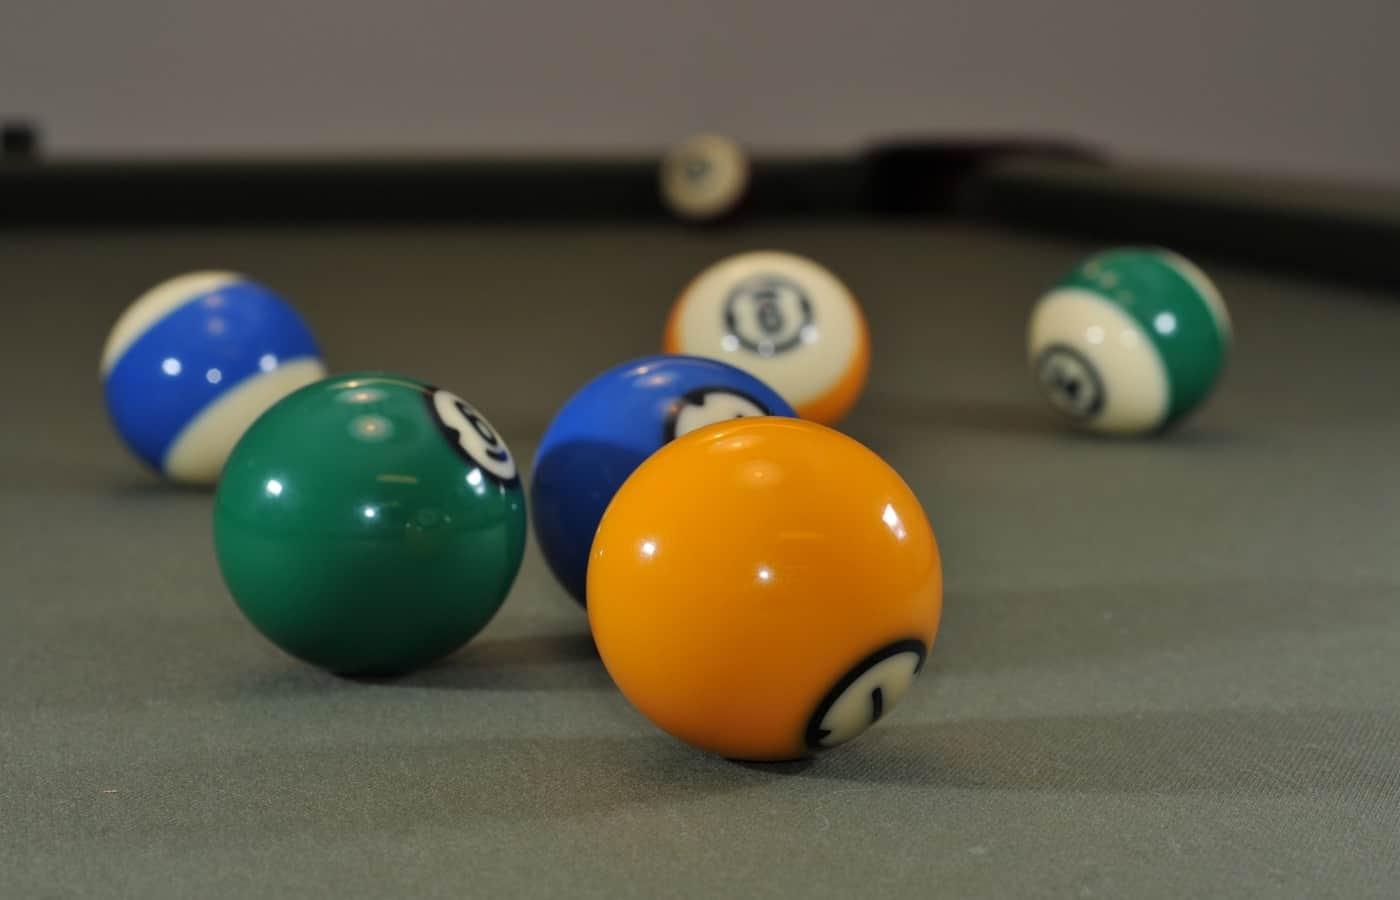 how are billiard balls made